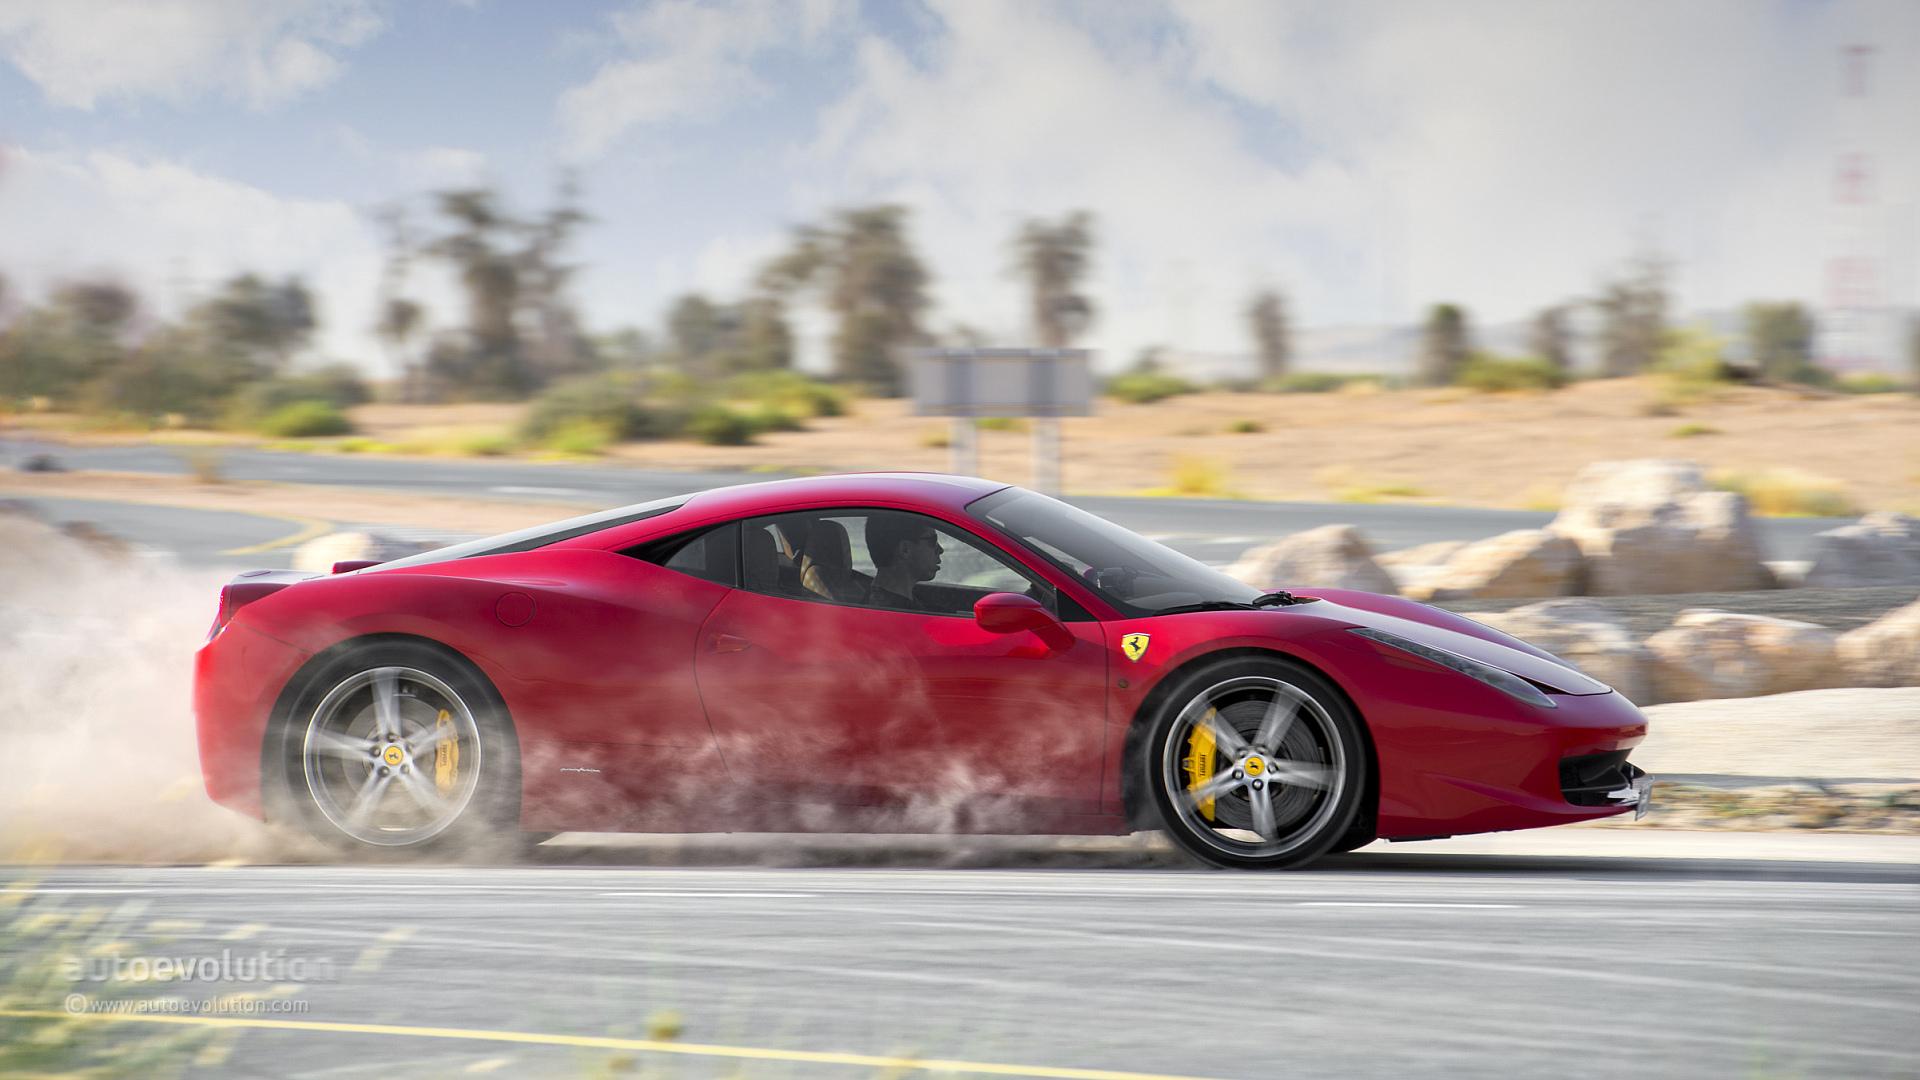 2013 ferrari 458 italia tested - autoevolution